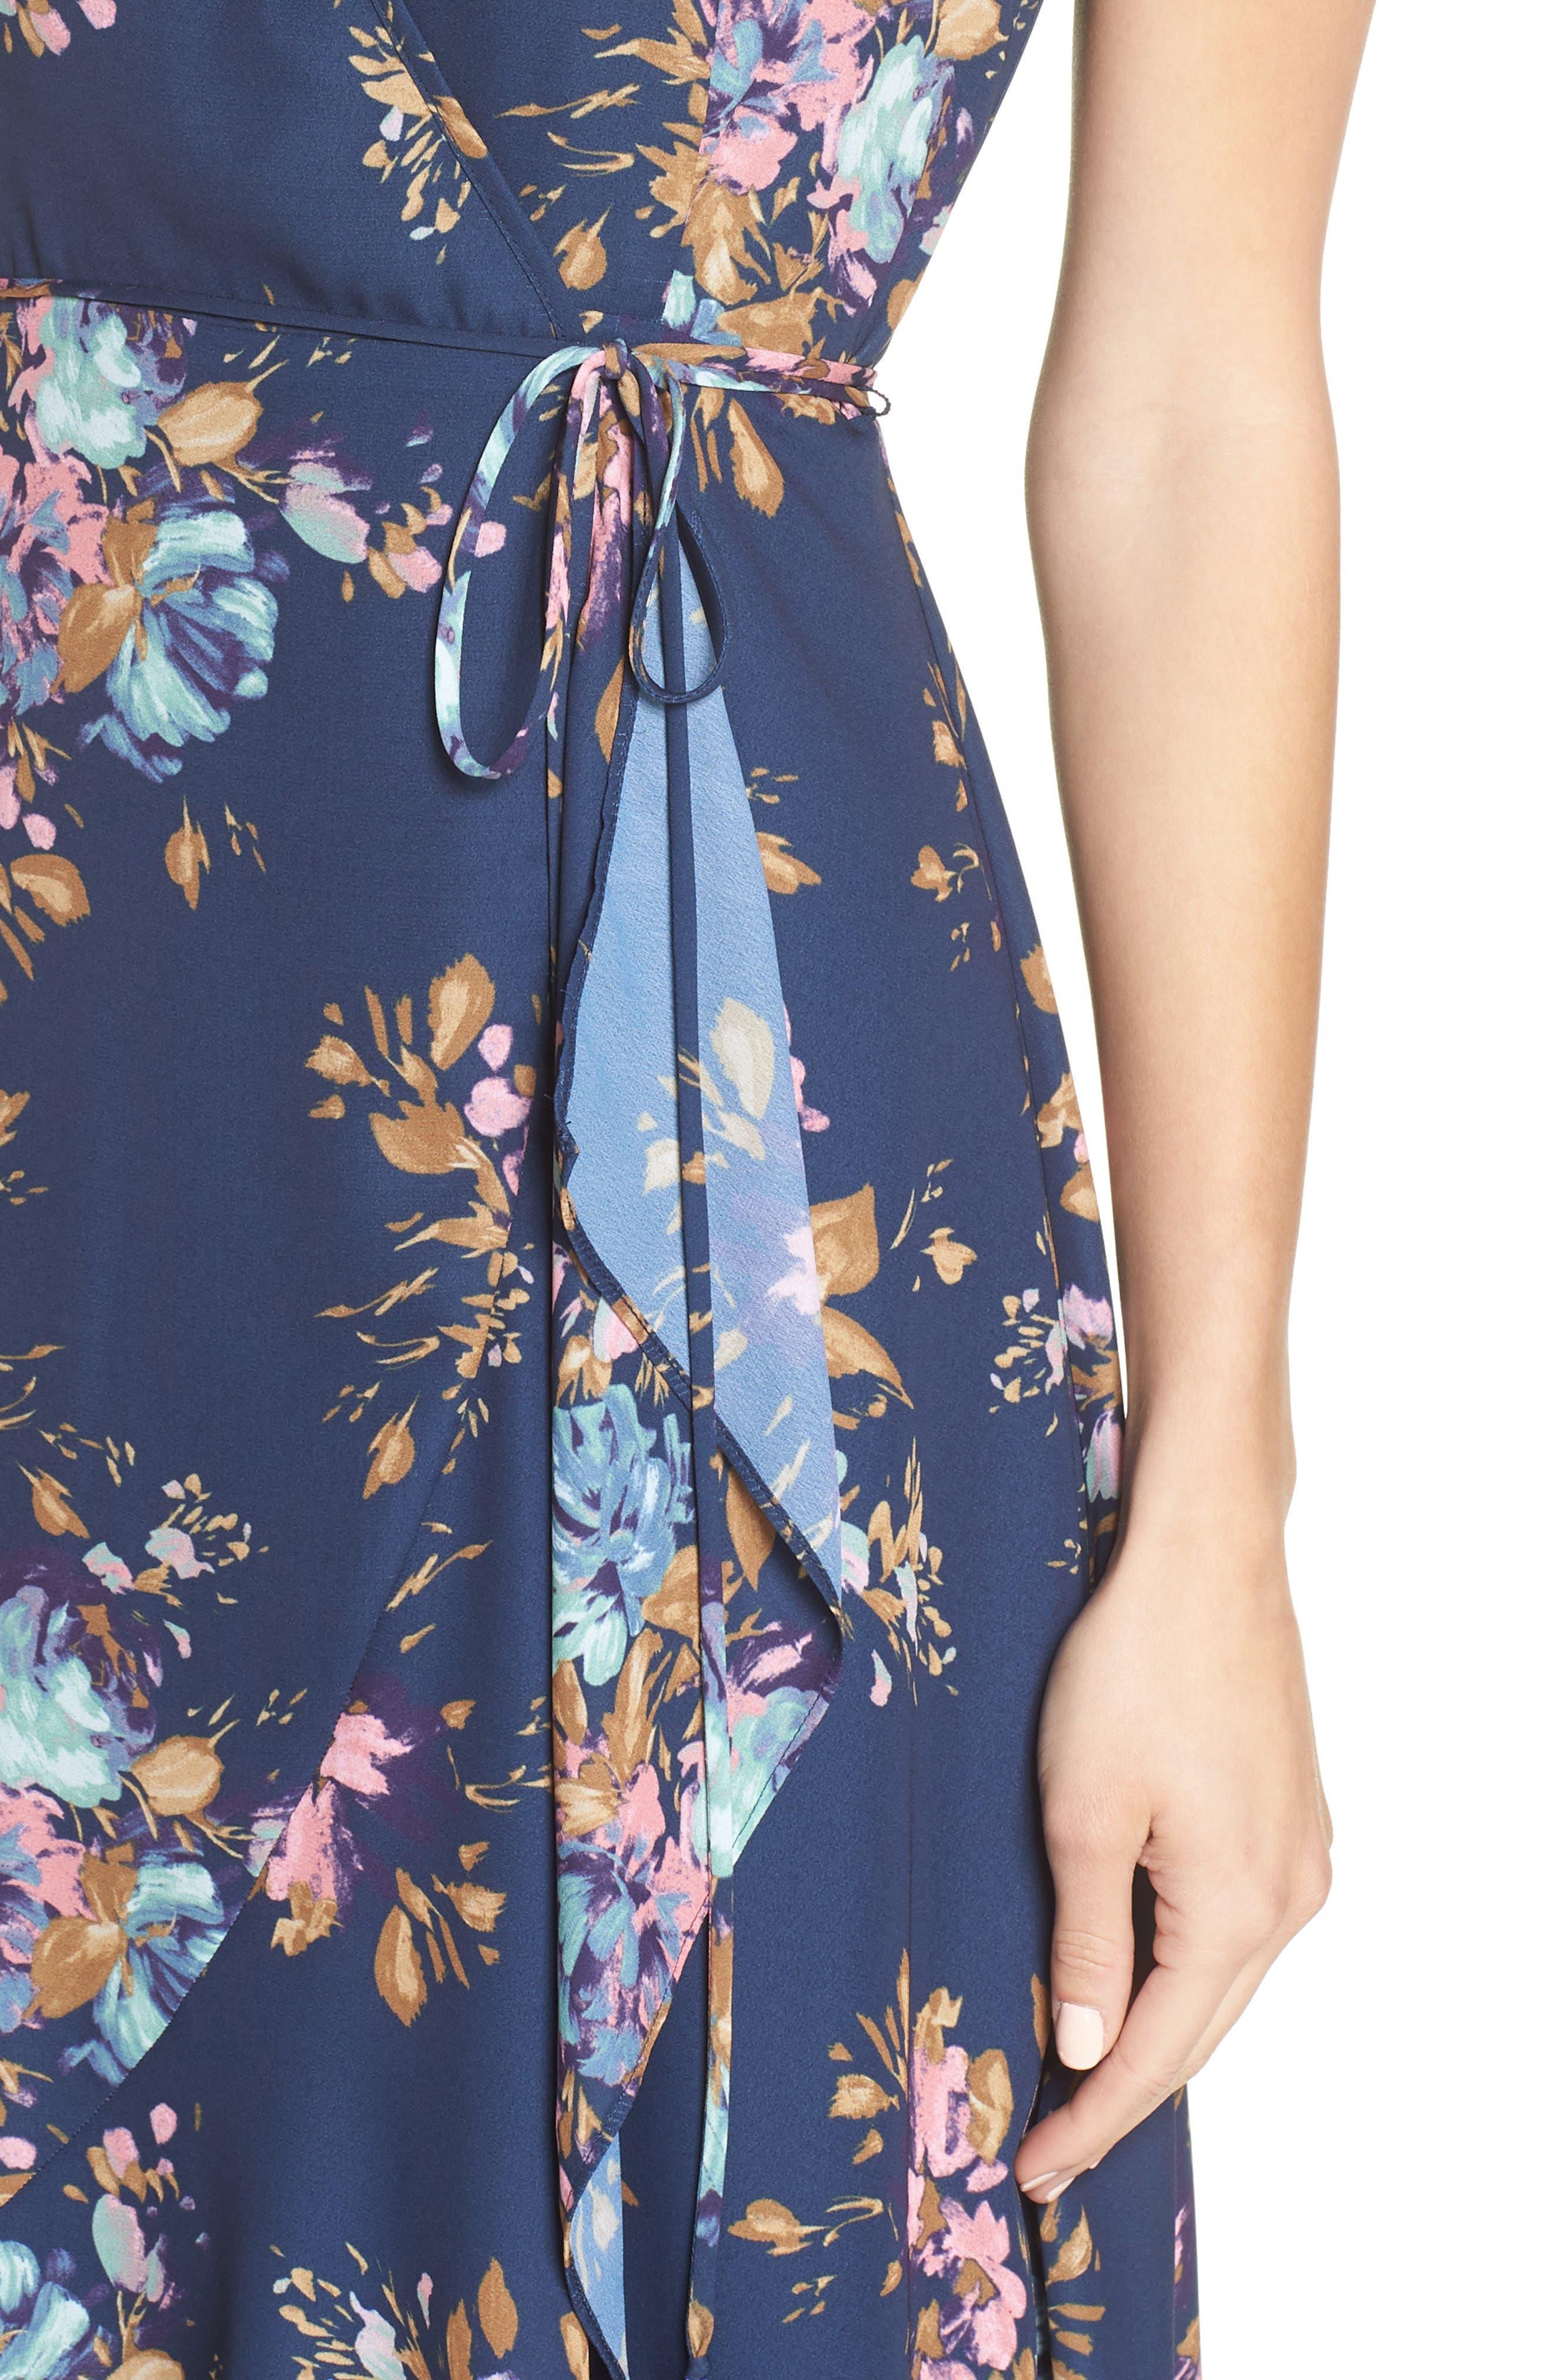 Floral Sleeveless Wrap Dress,                             Alternate thumbnail 4, color,                             473